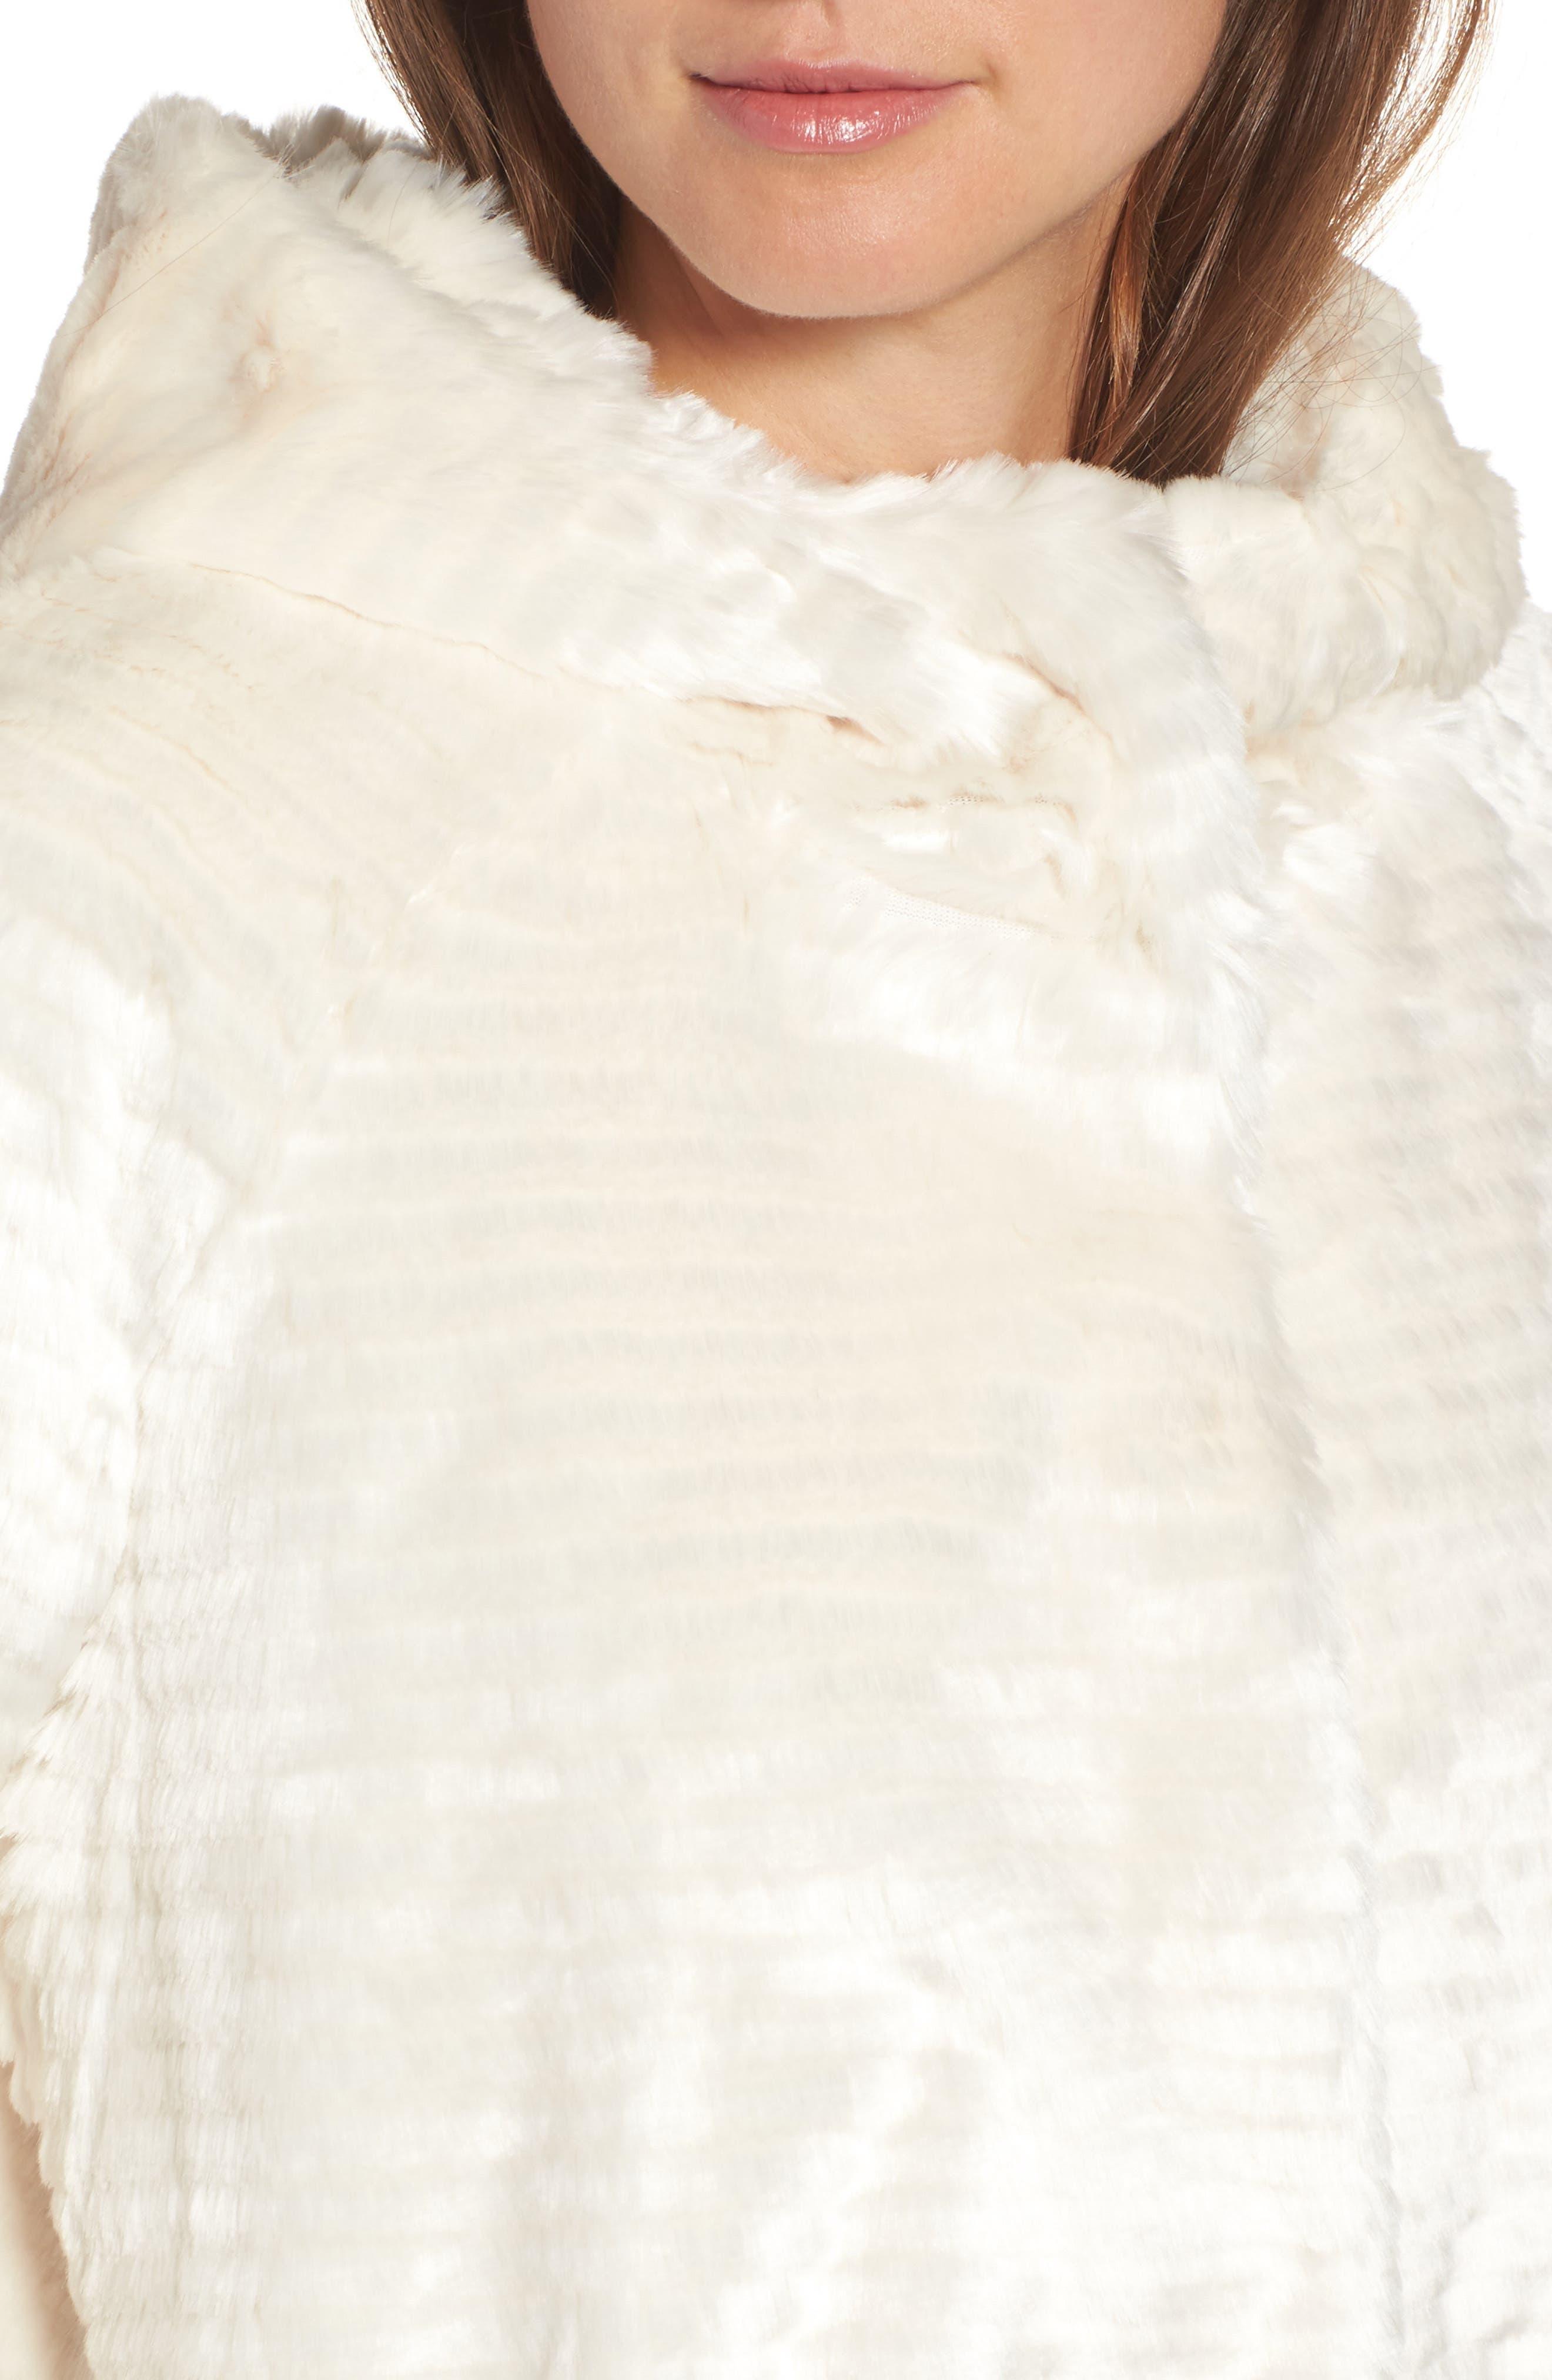 VINCE CAMUTO,                             Hooded Faux Fur Coat,                             Alternate thumbnail 4, color,                             100